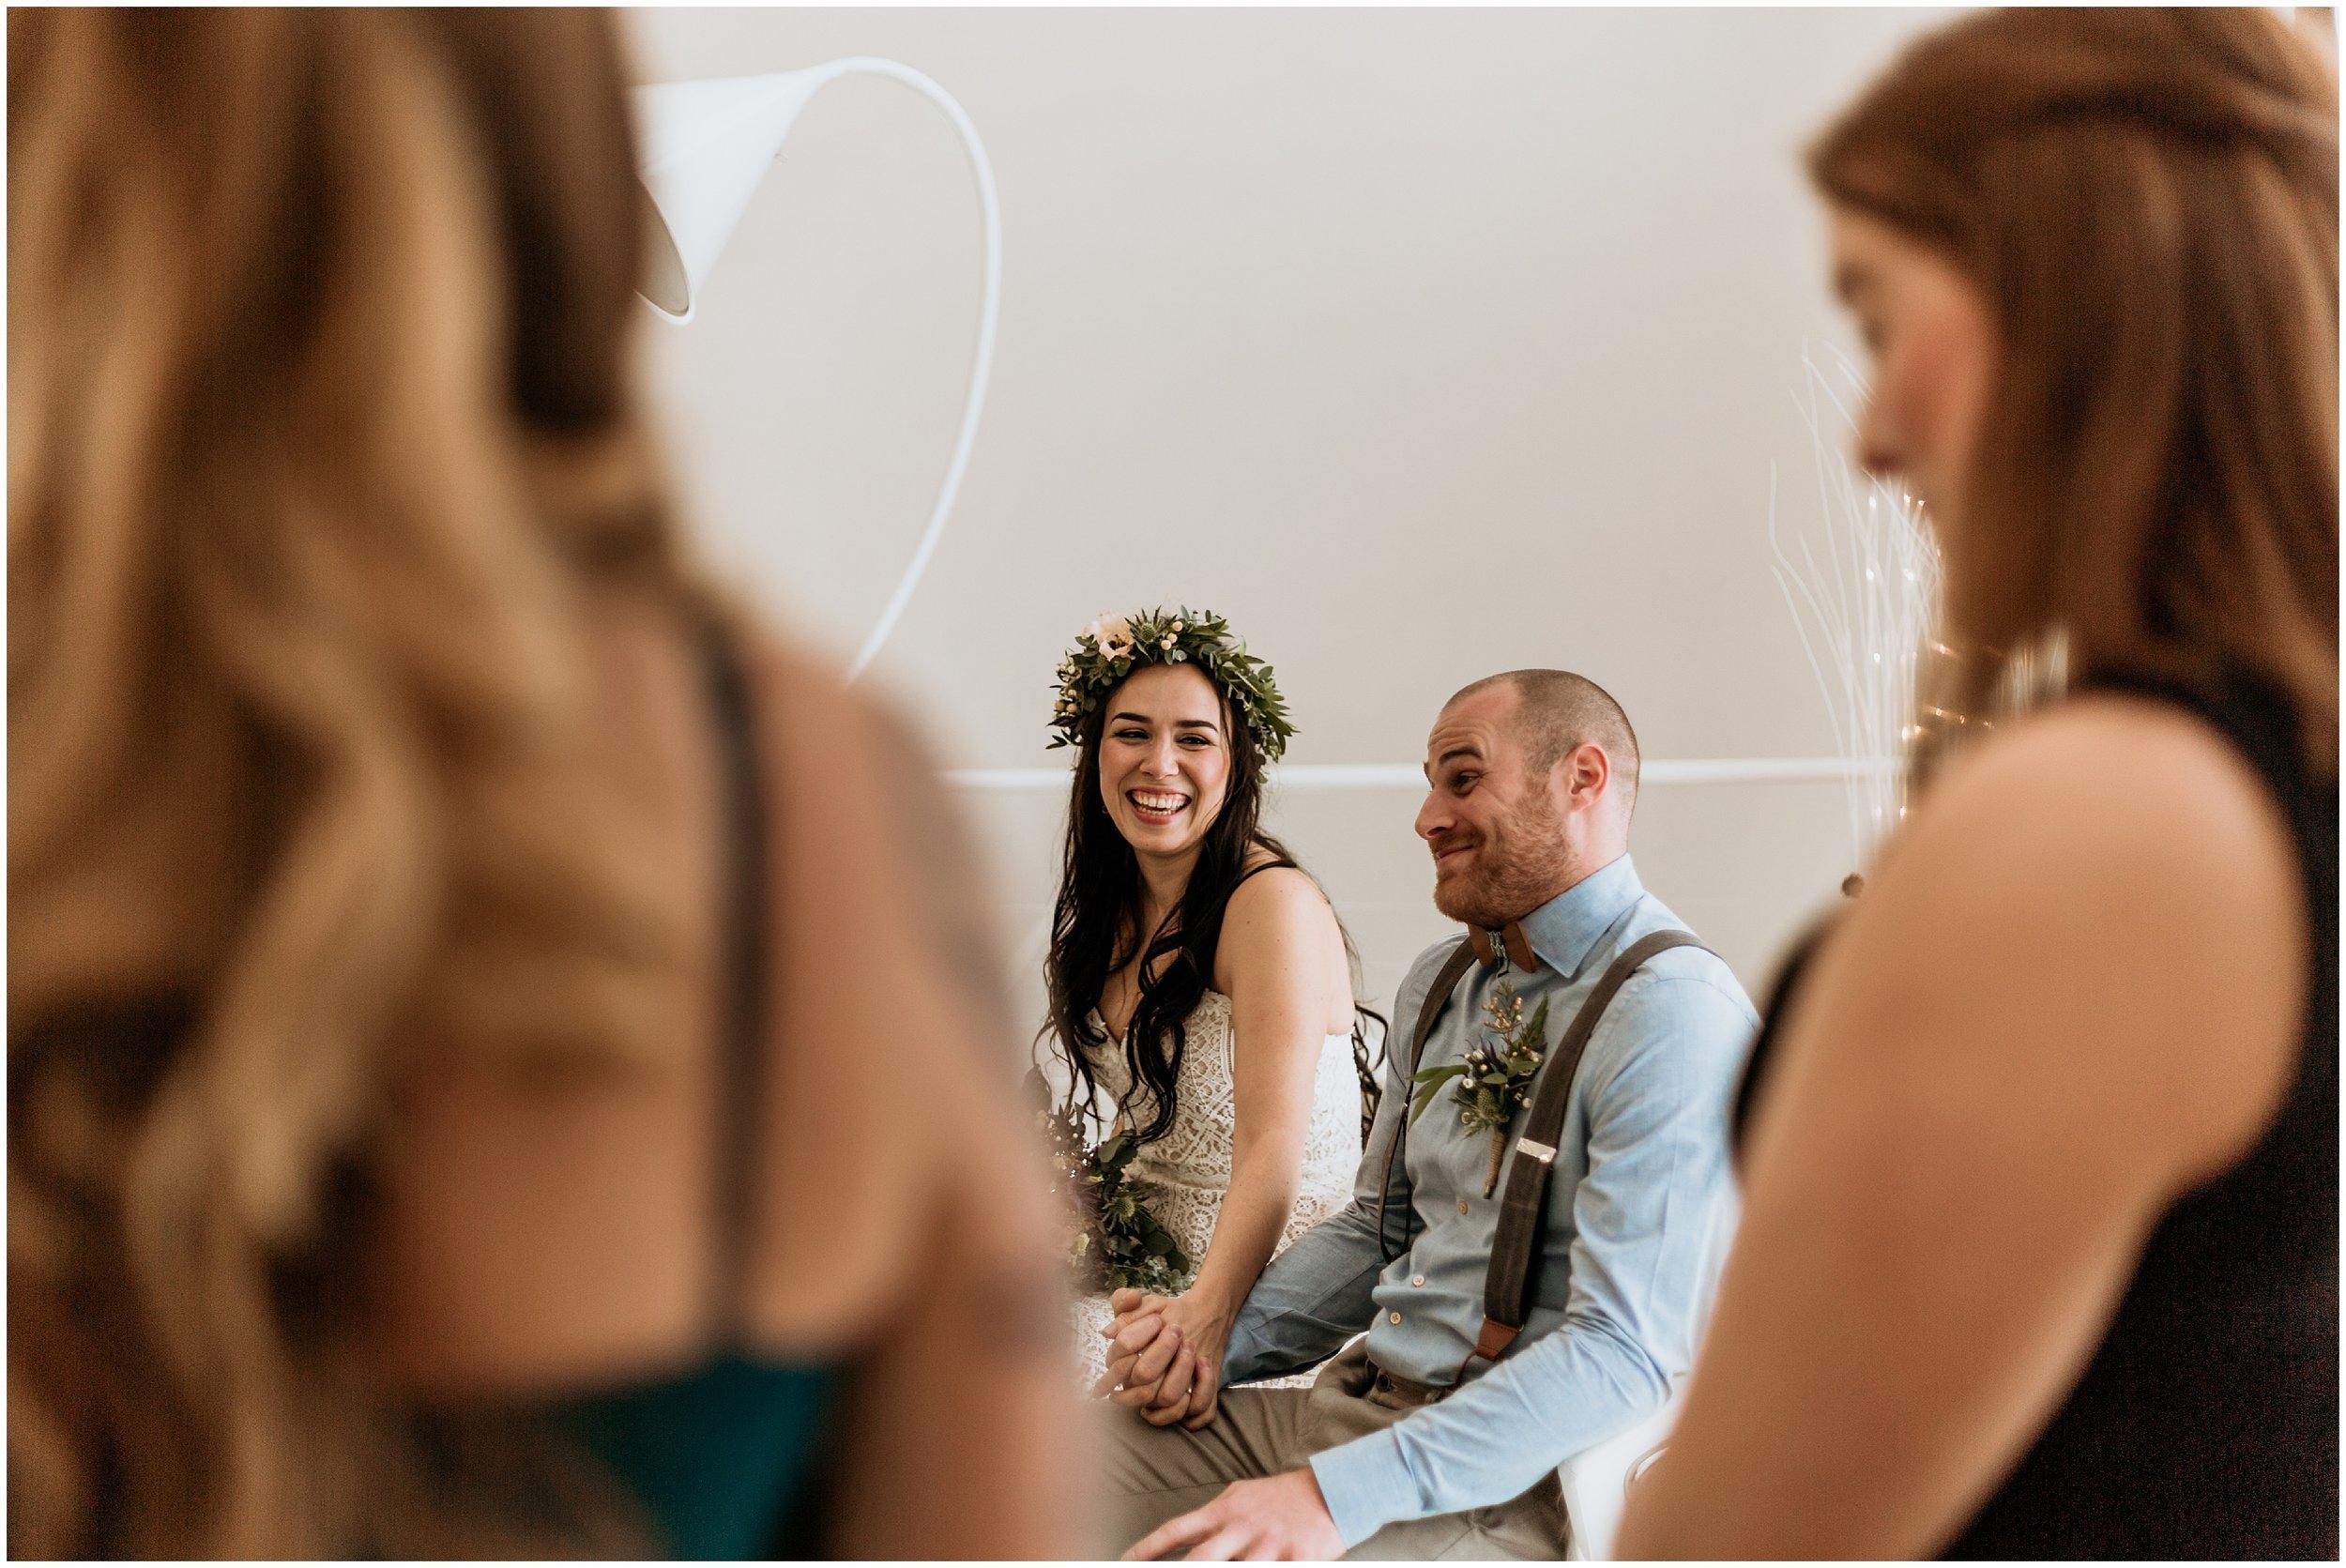 huwelijksfotografie-jana-joeri-ardennen-sechery_0013.jpg